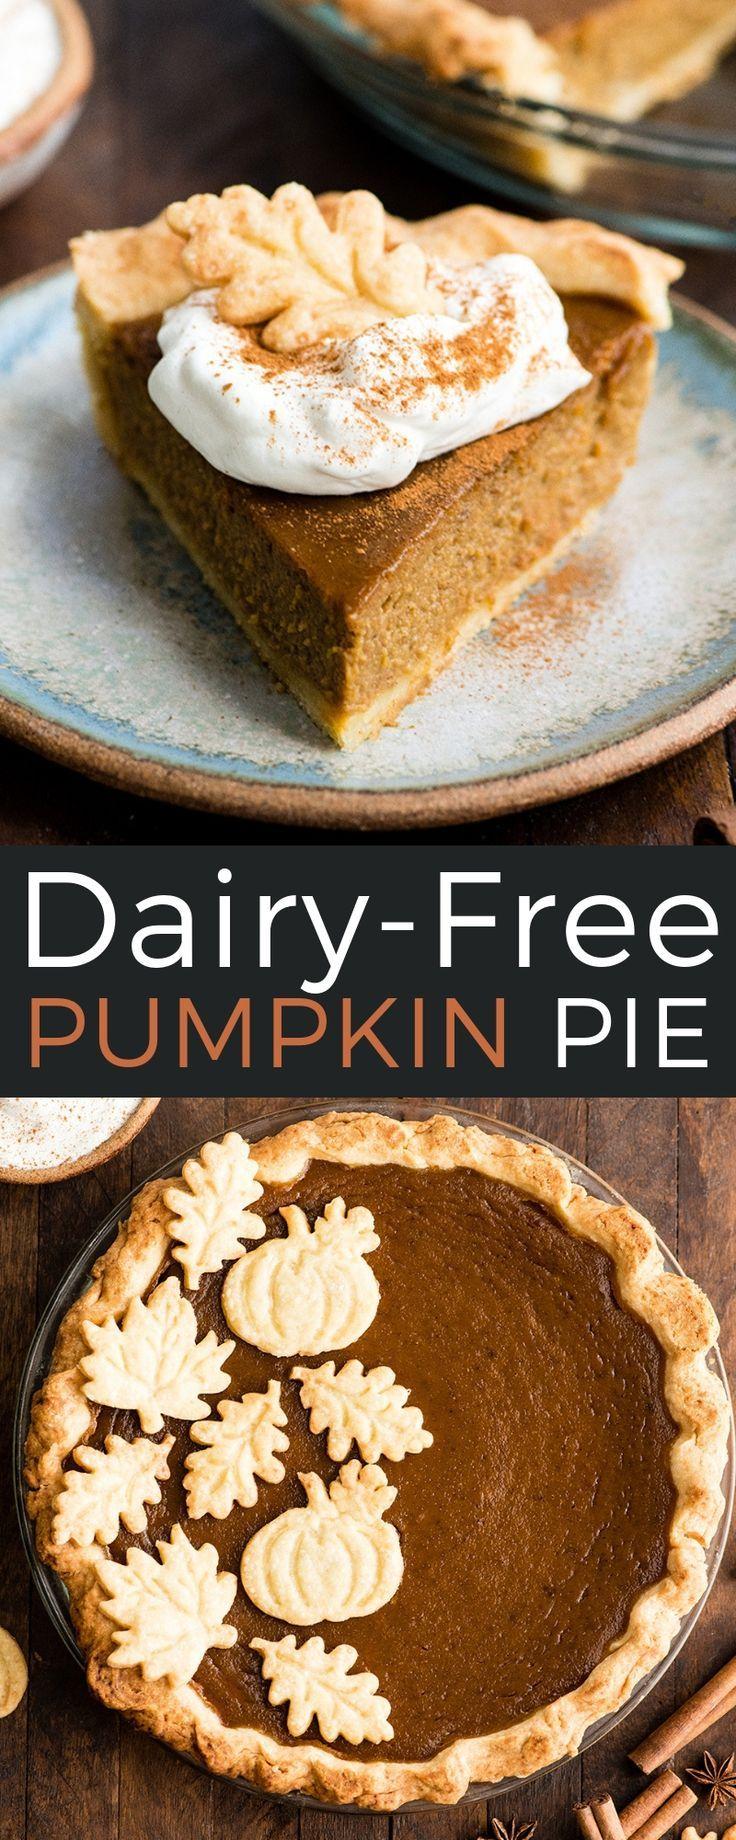 Homemade Dairy-Free Pumpkin Pie recipe from scratch